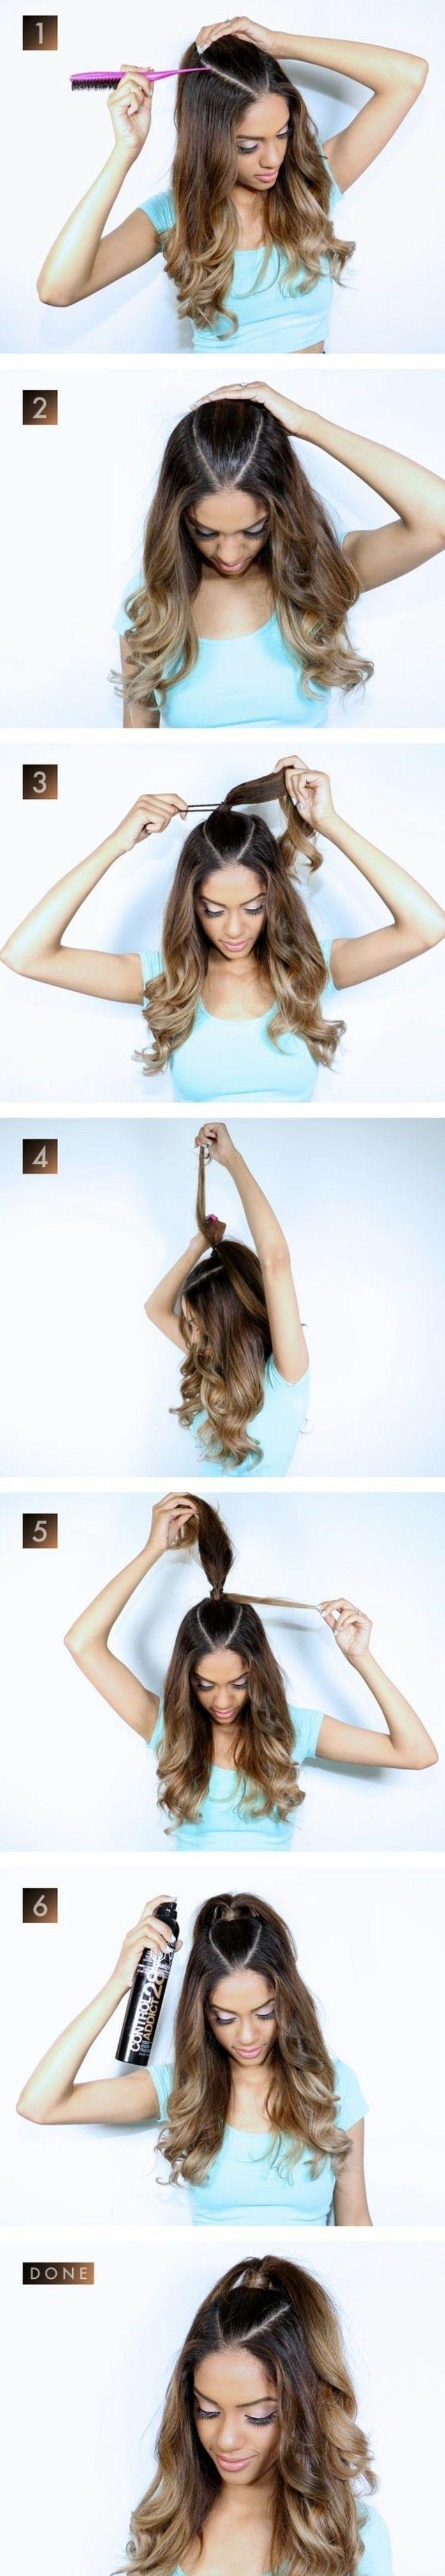 Pin by shahd on hair beauty | Pinterest | Girl hair